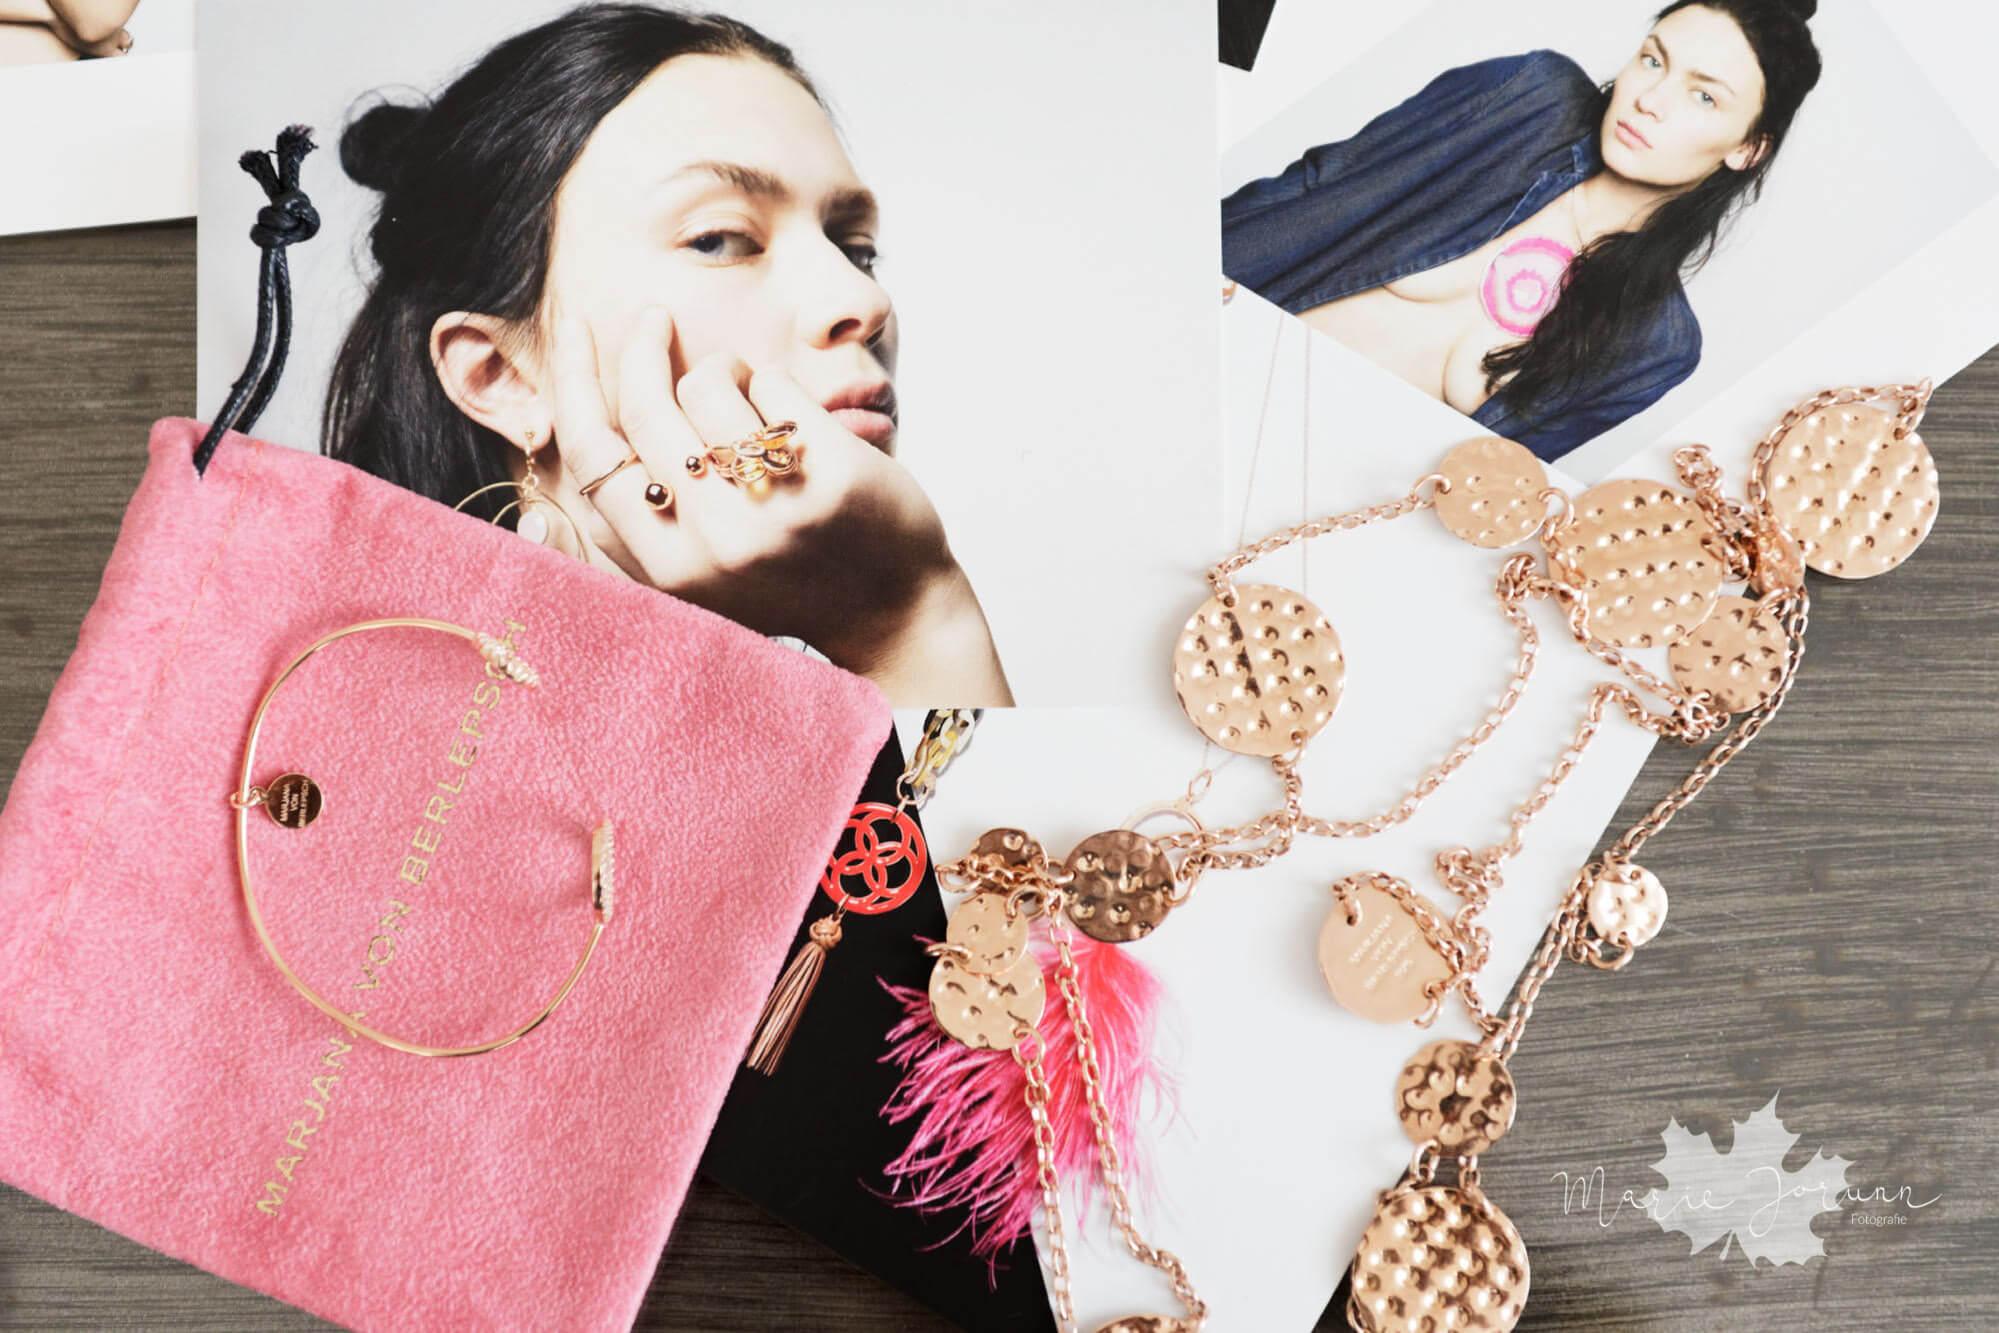 Marie Jorunn_Fashion34